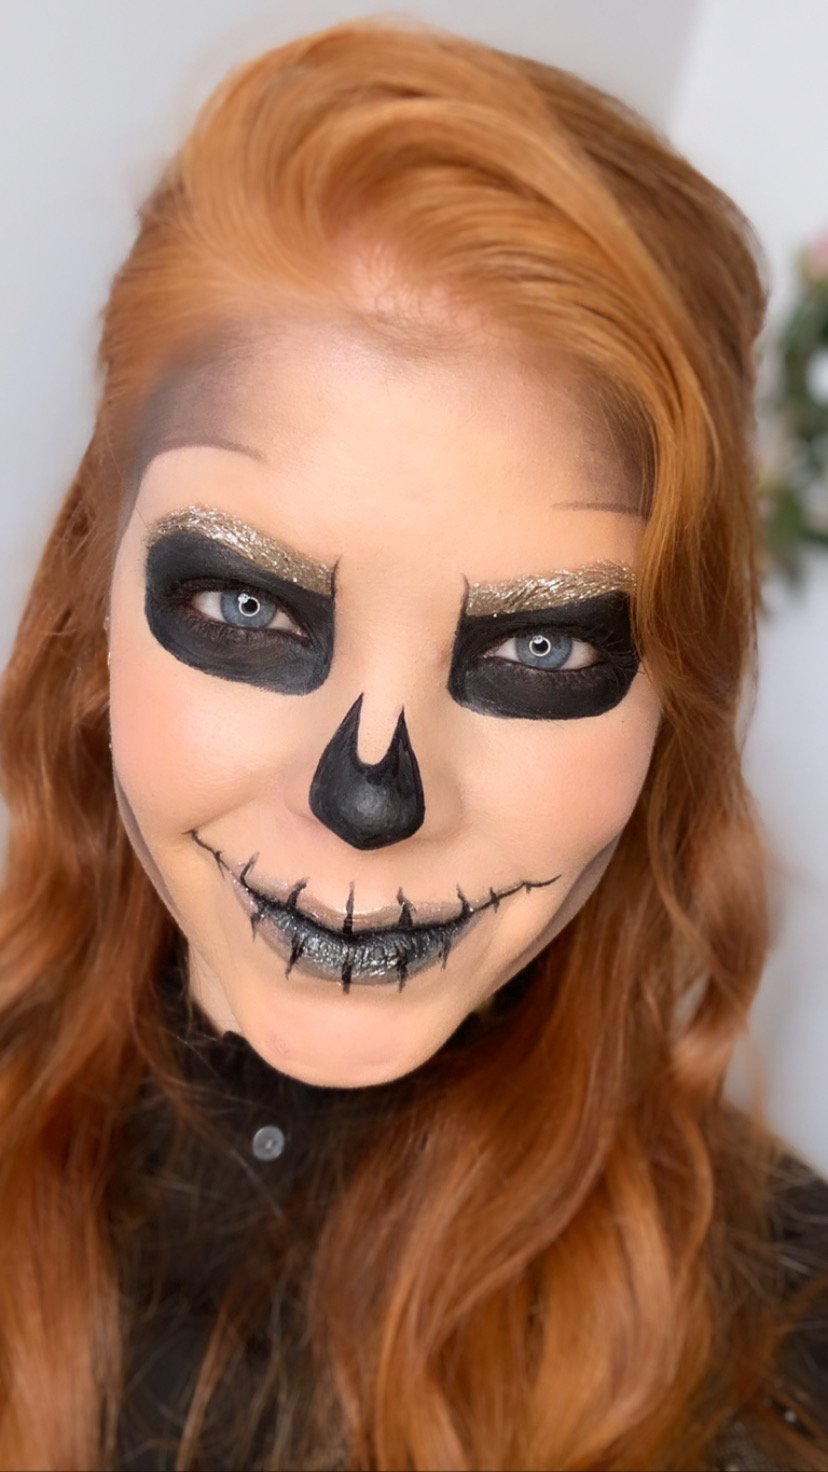 How To: DIY Halloween Makeup Using Eyeko Favorites